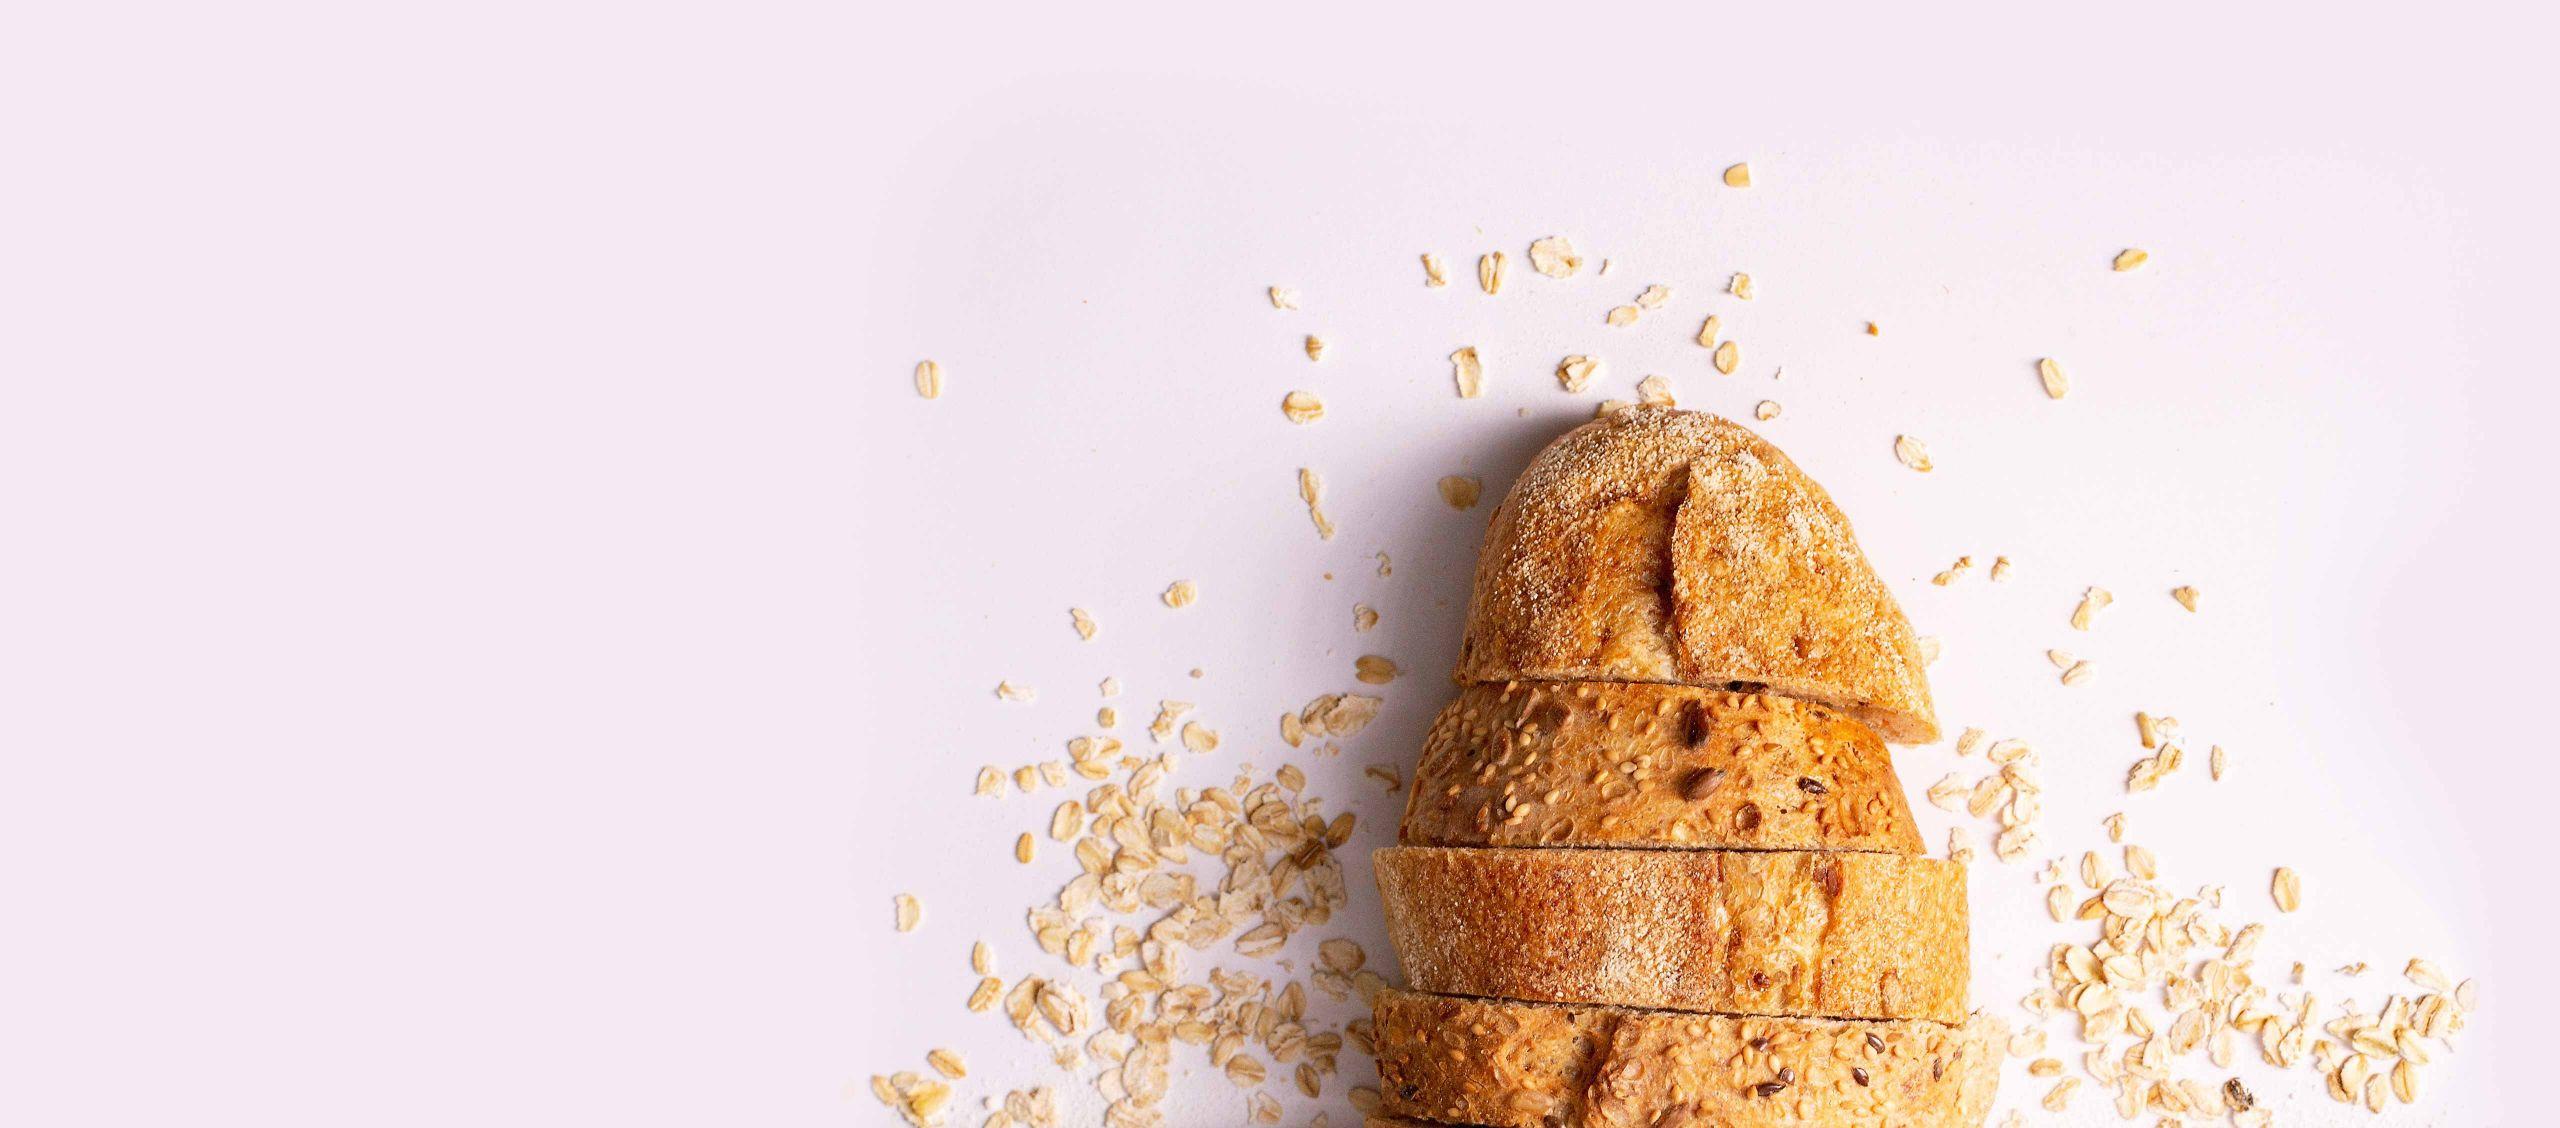 hero-header-bakery